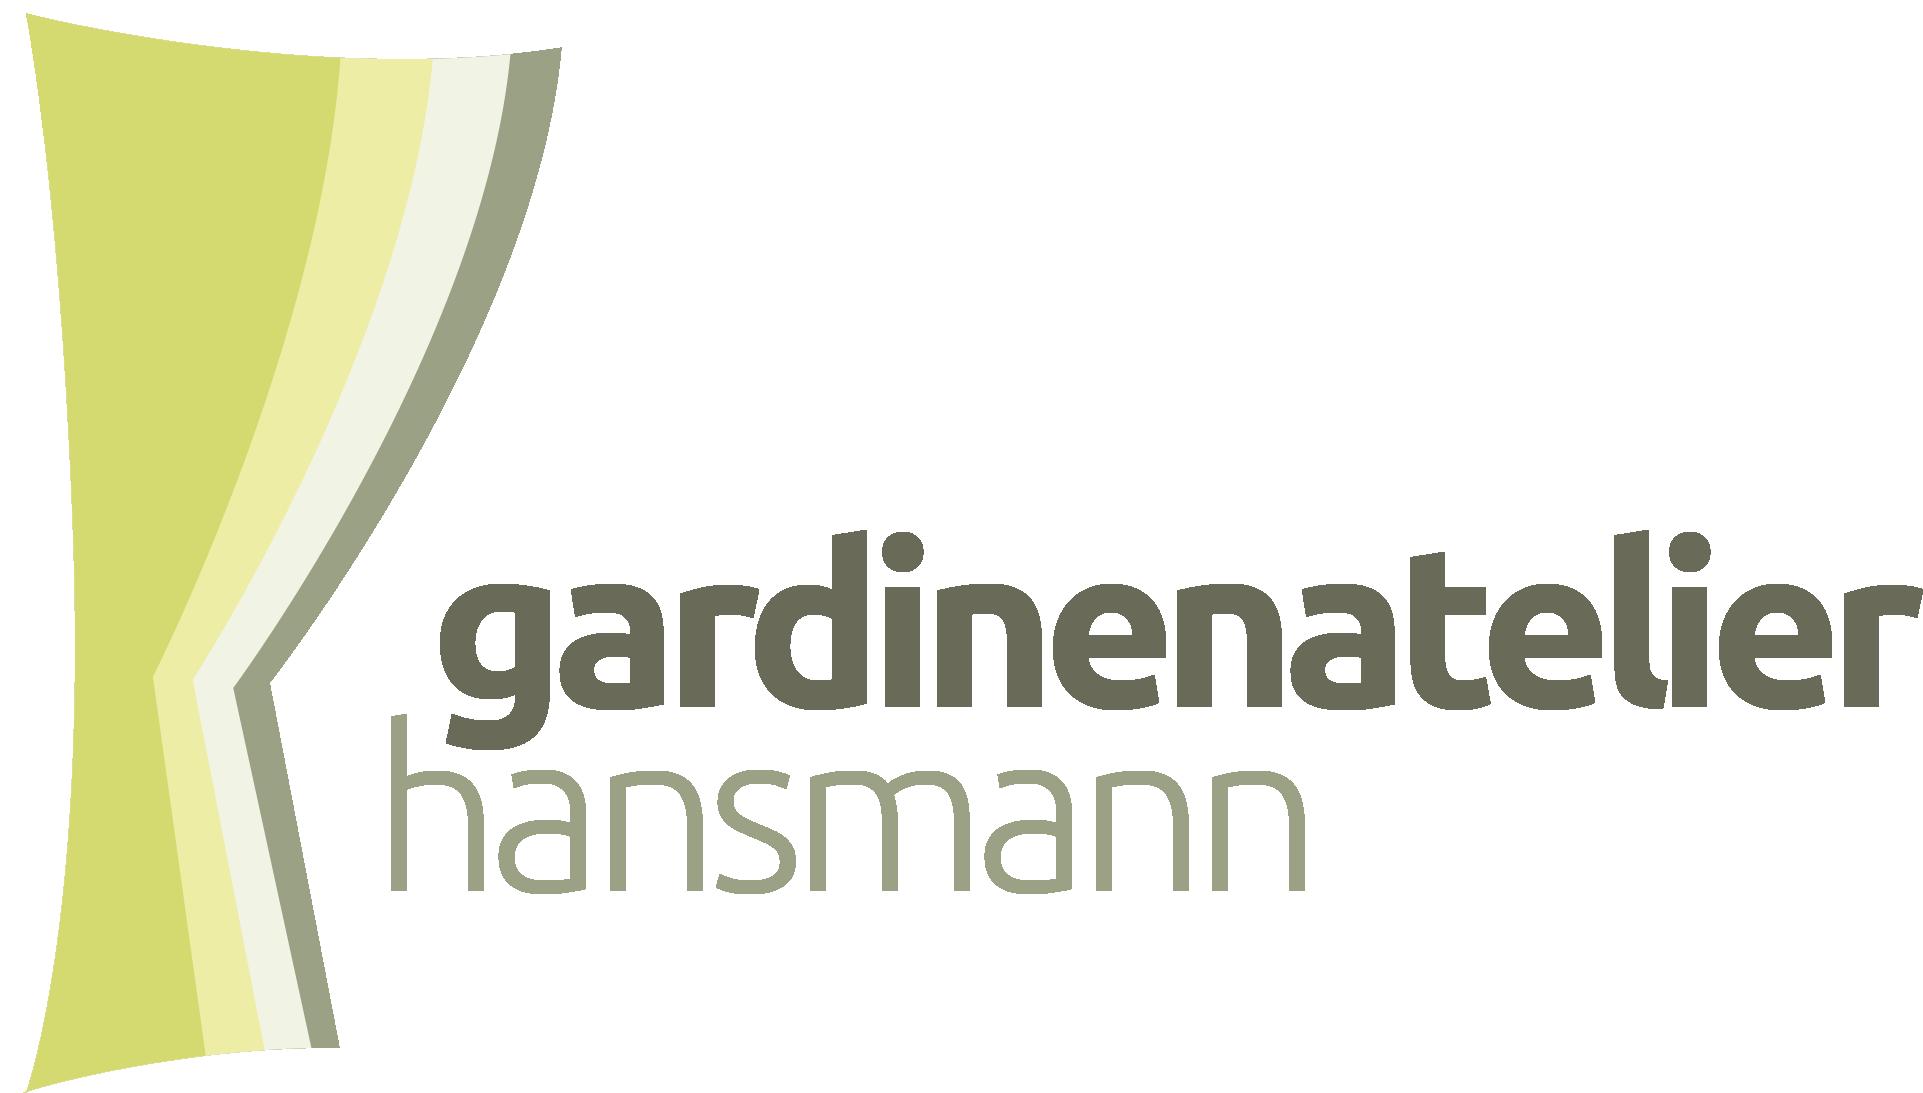 Gardinenatelier Hansmann